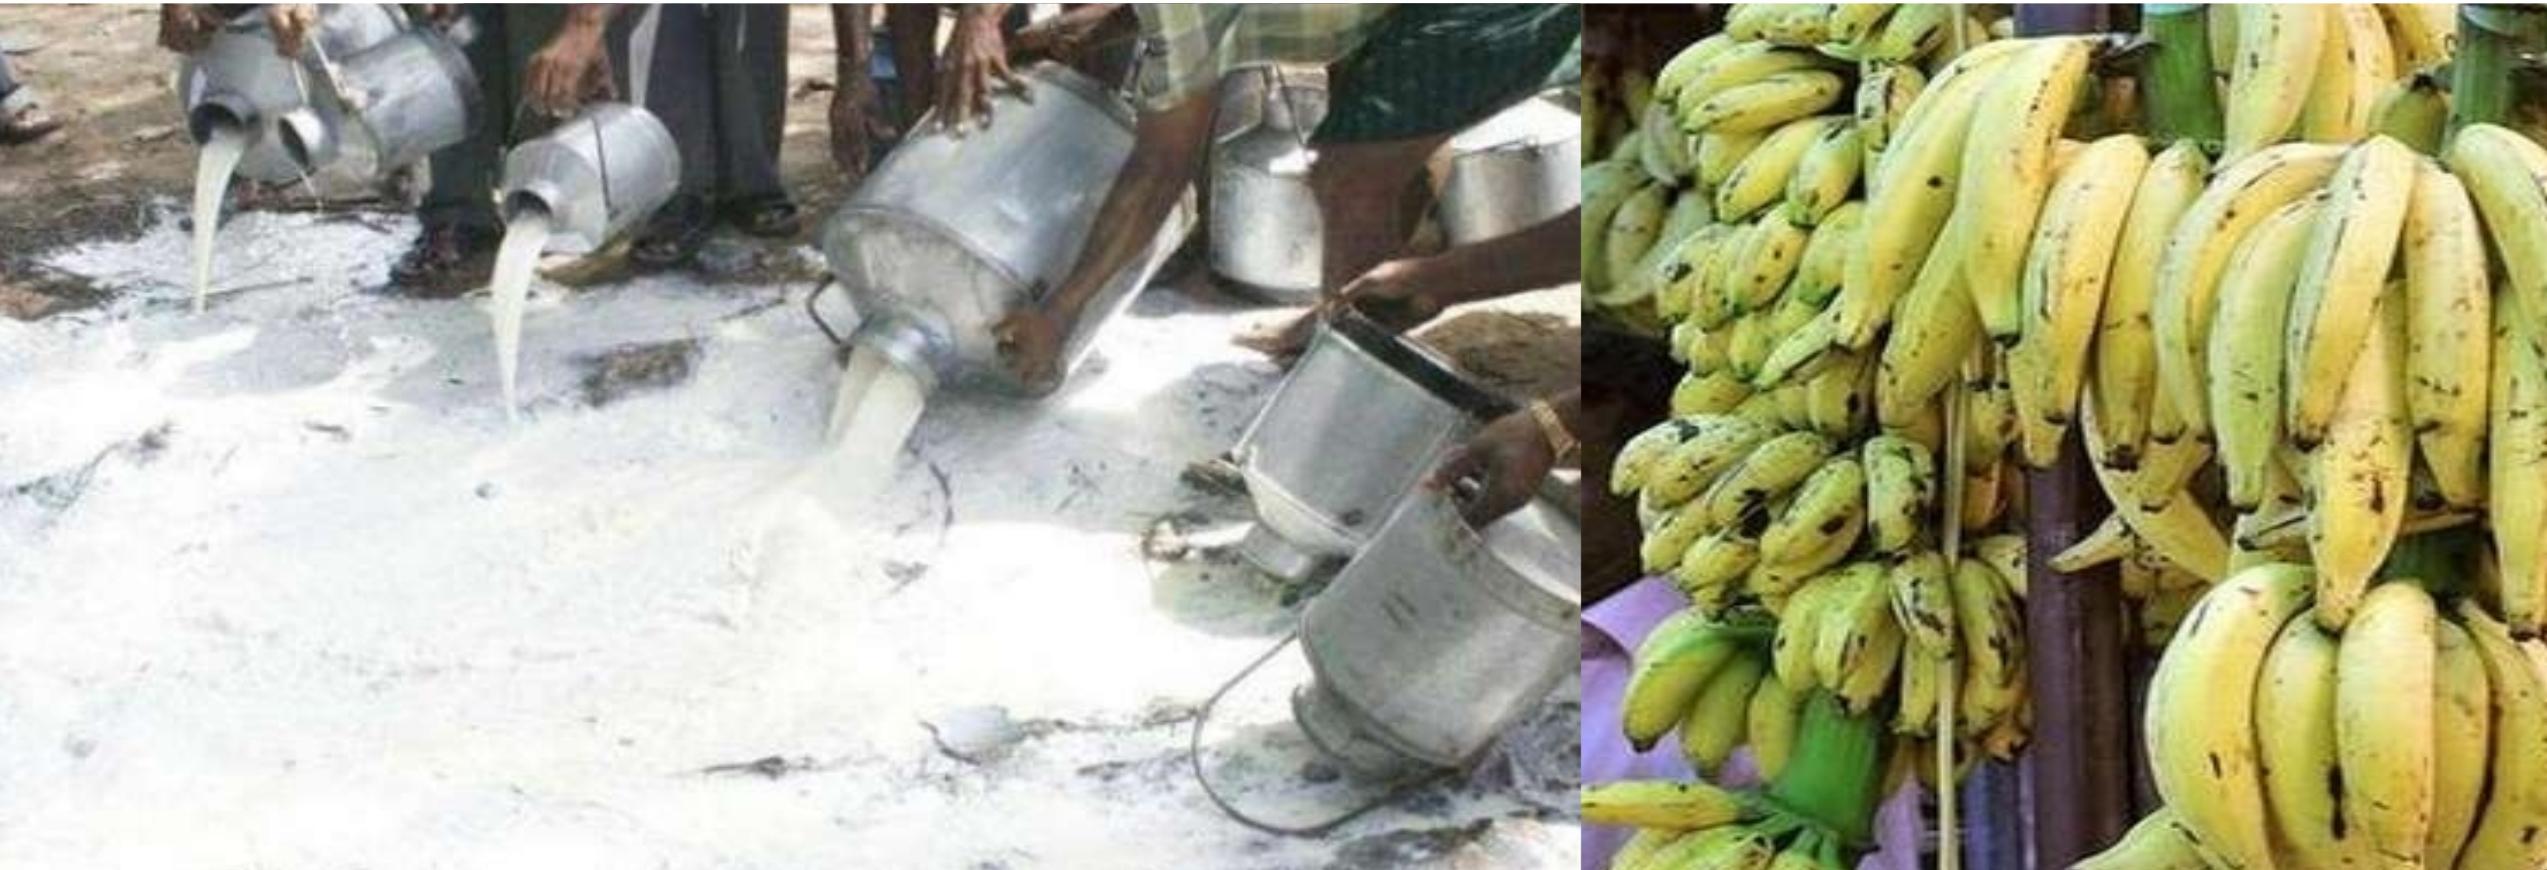 Banana, milk destroyed